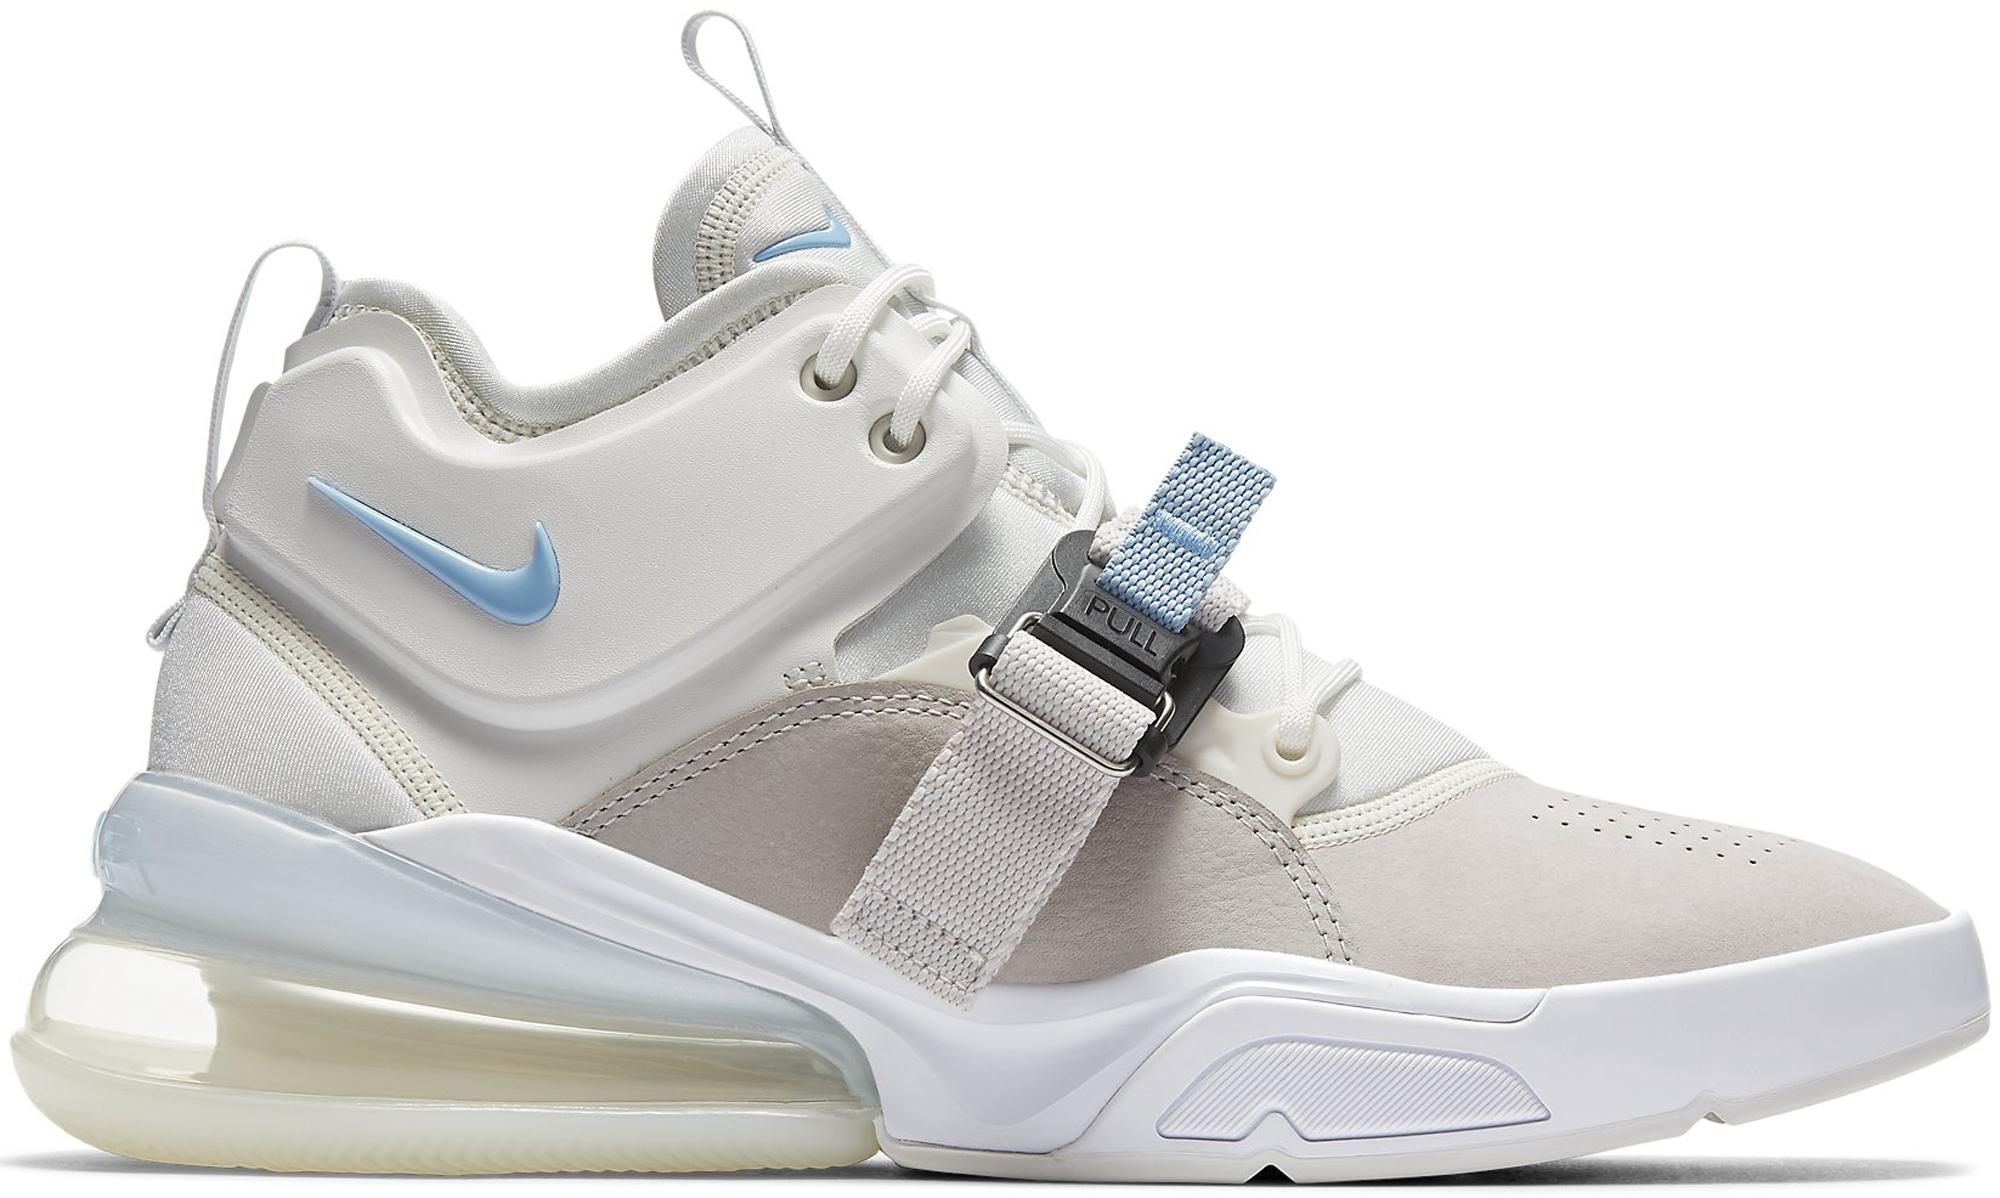 Nike Air Force De 270 Fantôme